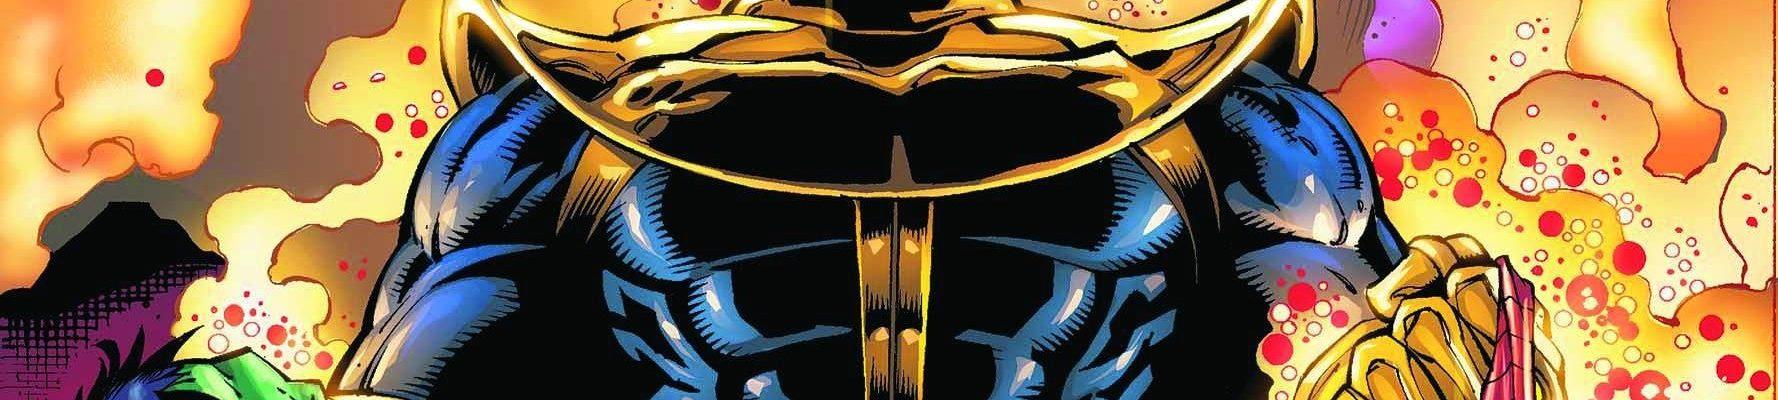 SDCC 2017 Solo Σειρά Για Τον Thanos